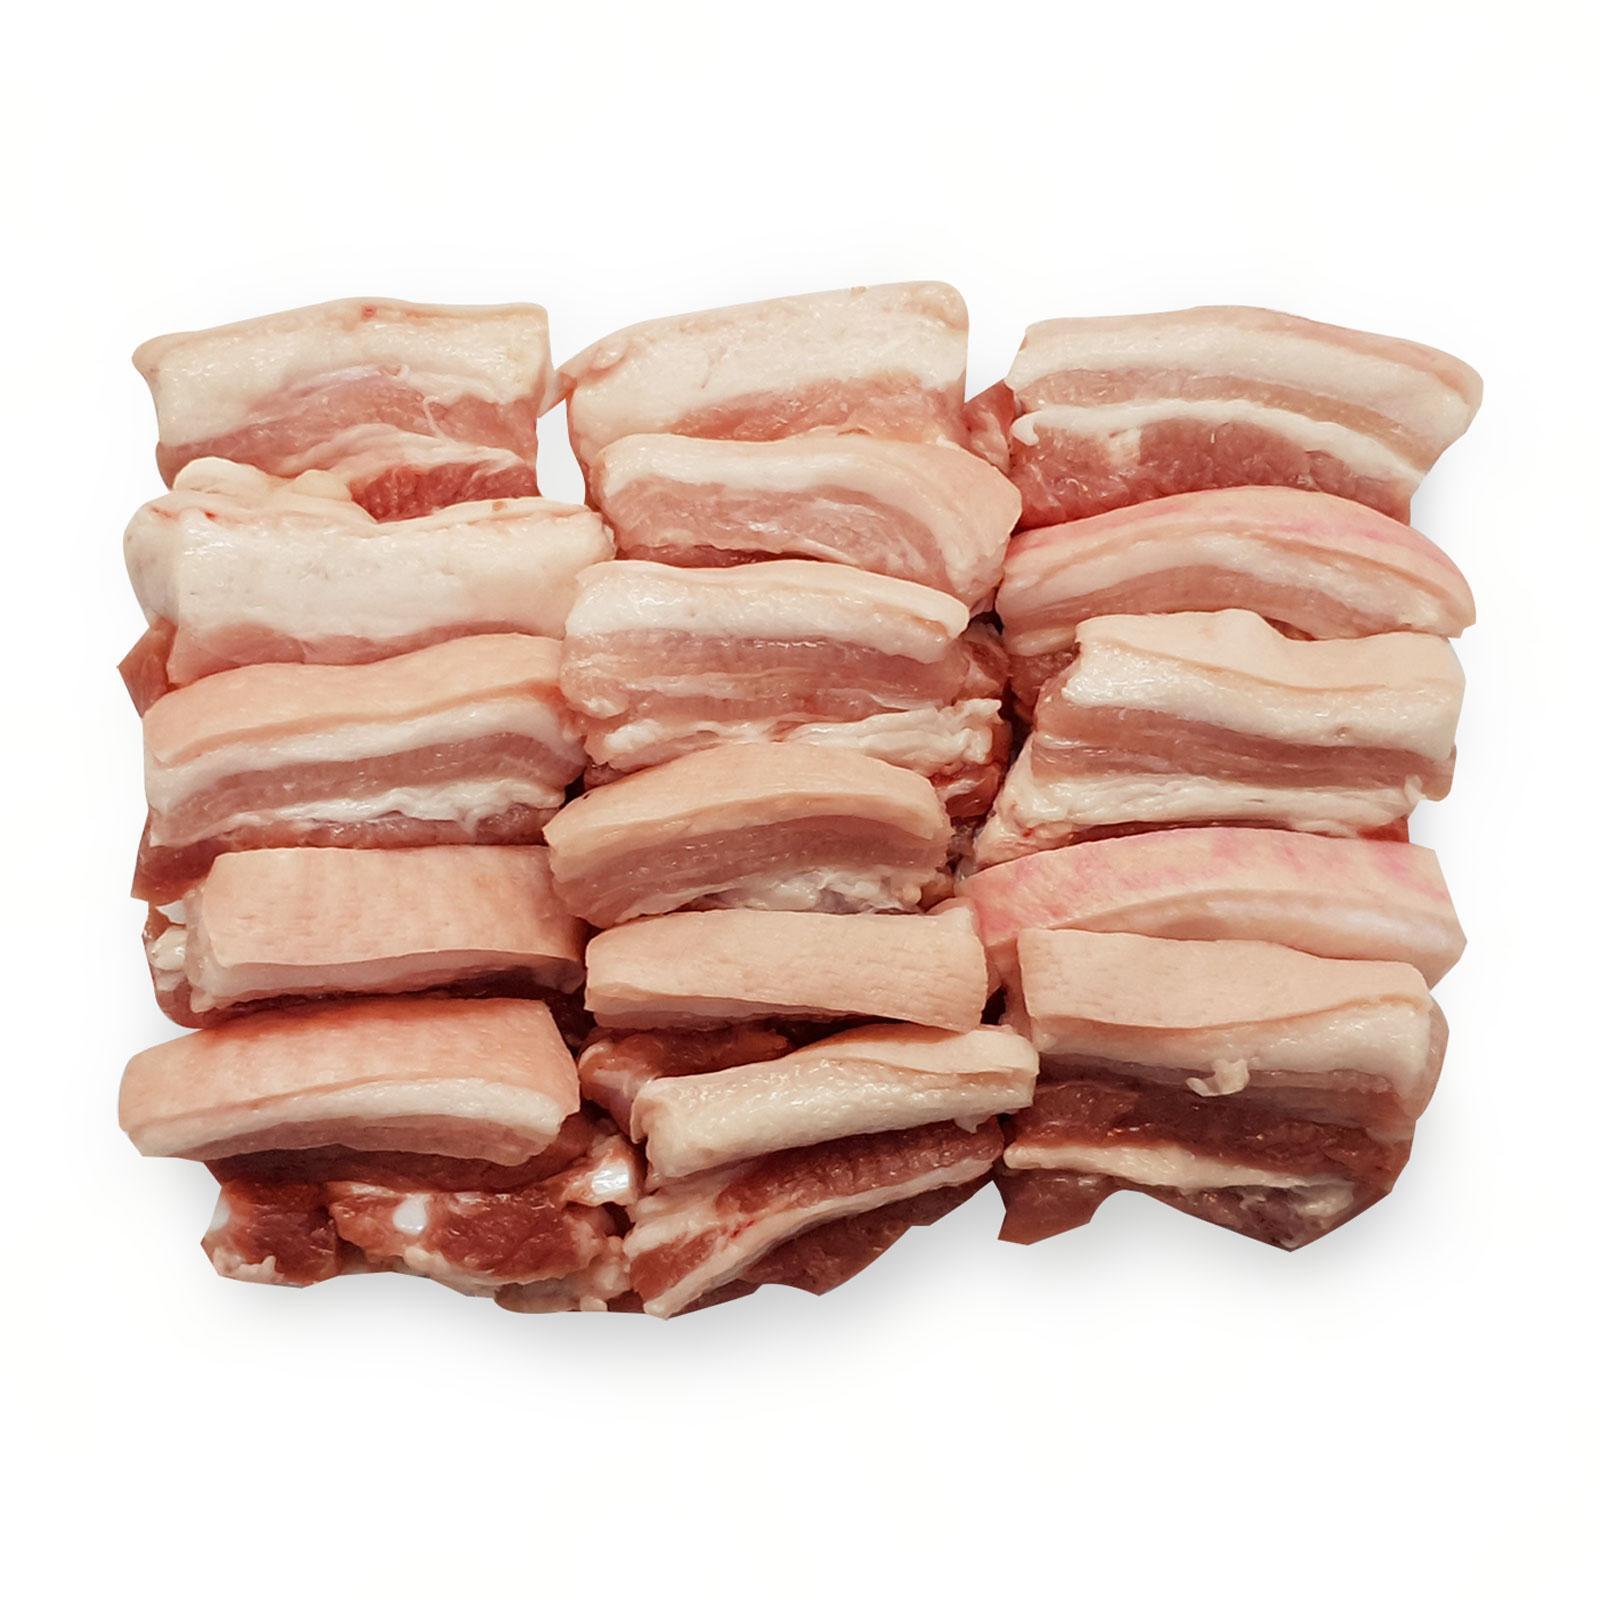 AW'S Market Pork Belly (Sliced)